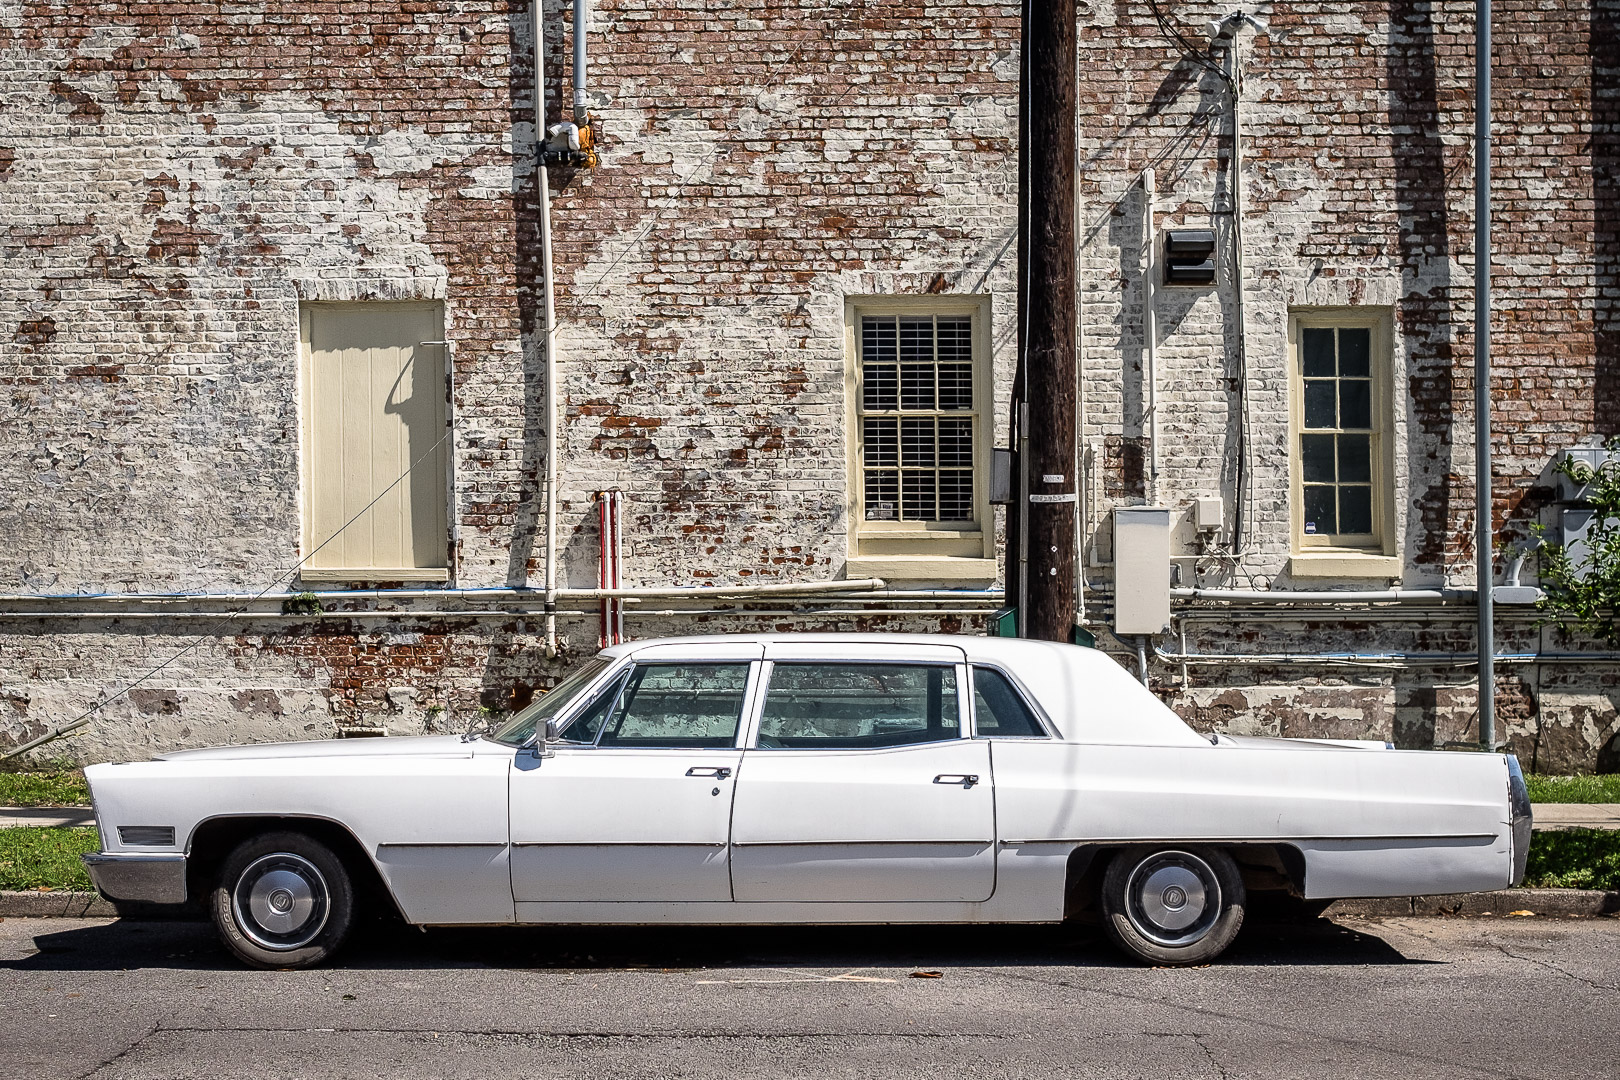 170404-New_Orleans-106-1080.jpg